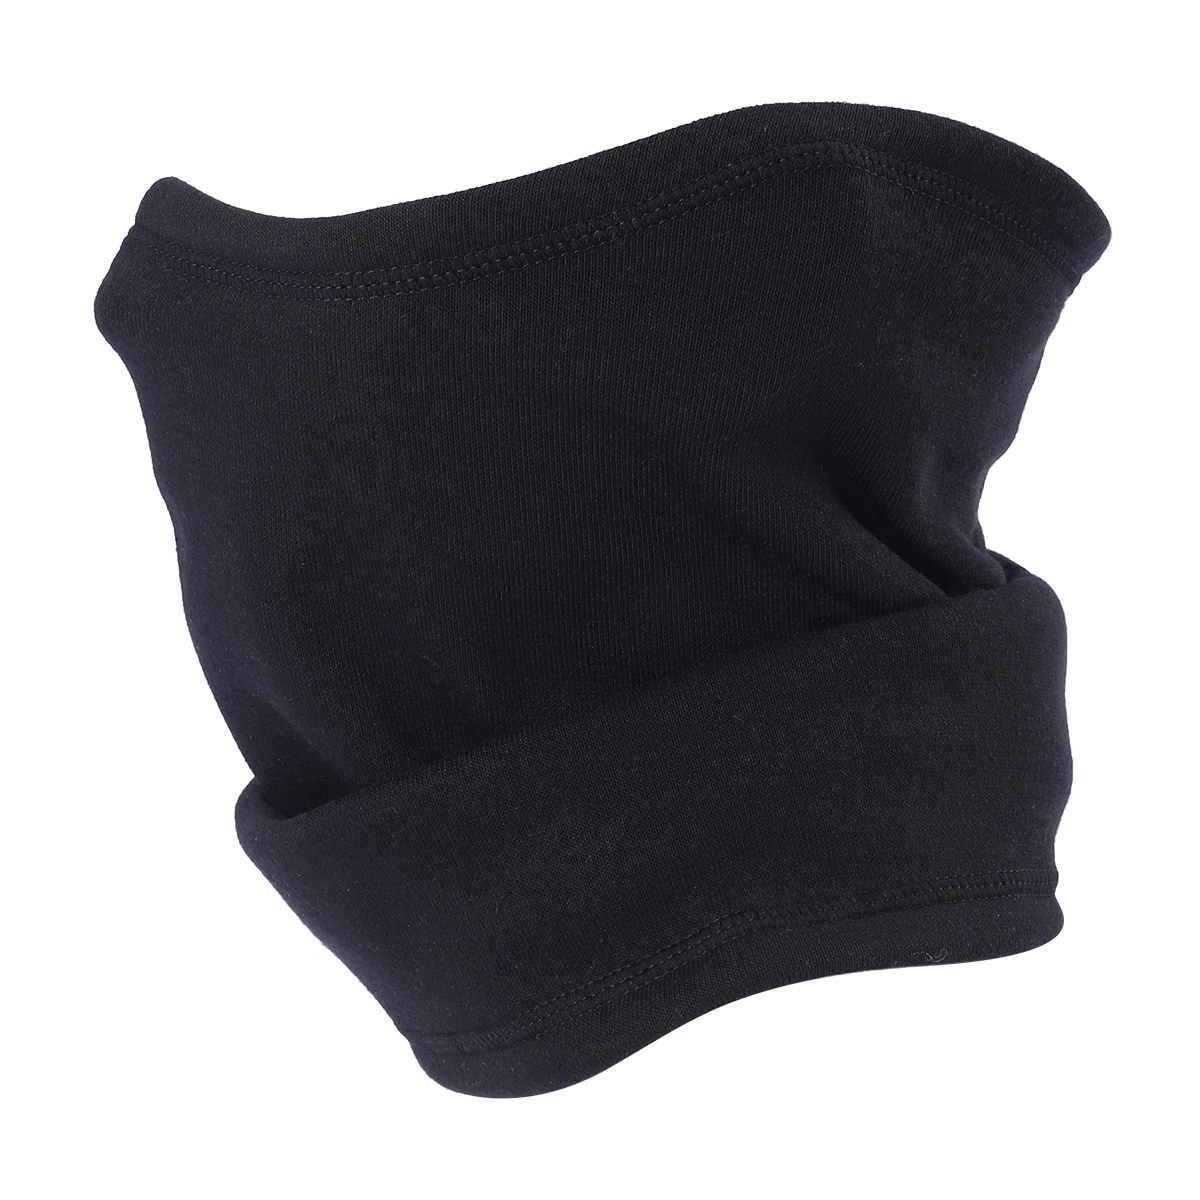 ba3983357aa ... Cold Weather Winter Magic Fleece Headband Neck Gaiter Tube Warmer Half  Face Mask Scarf Hood Snowboard ...